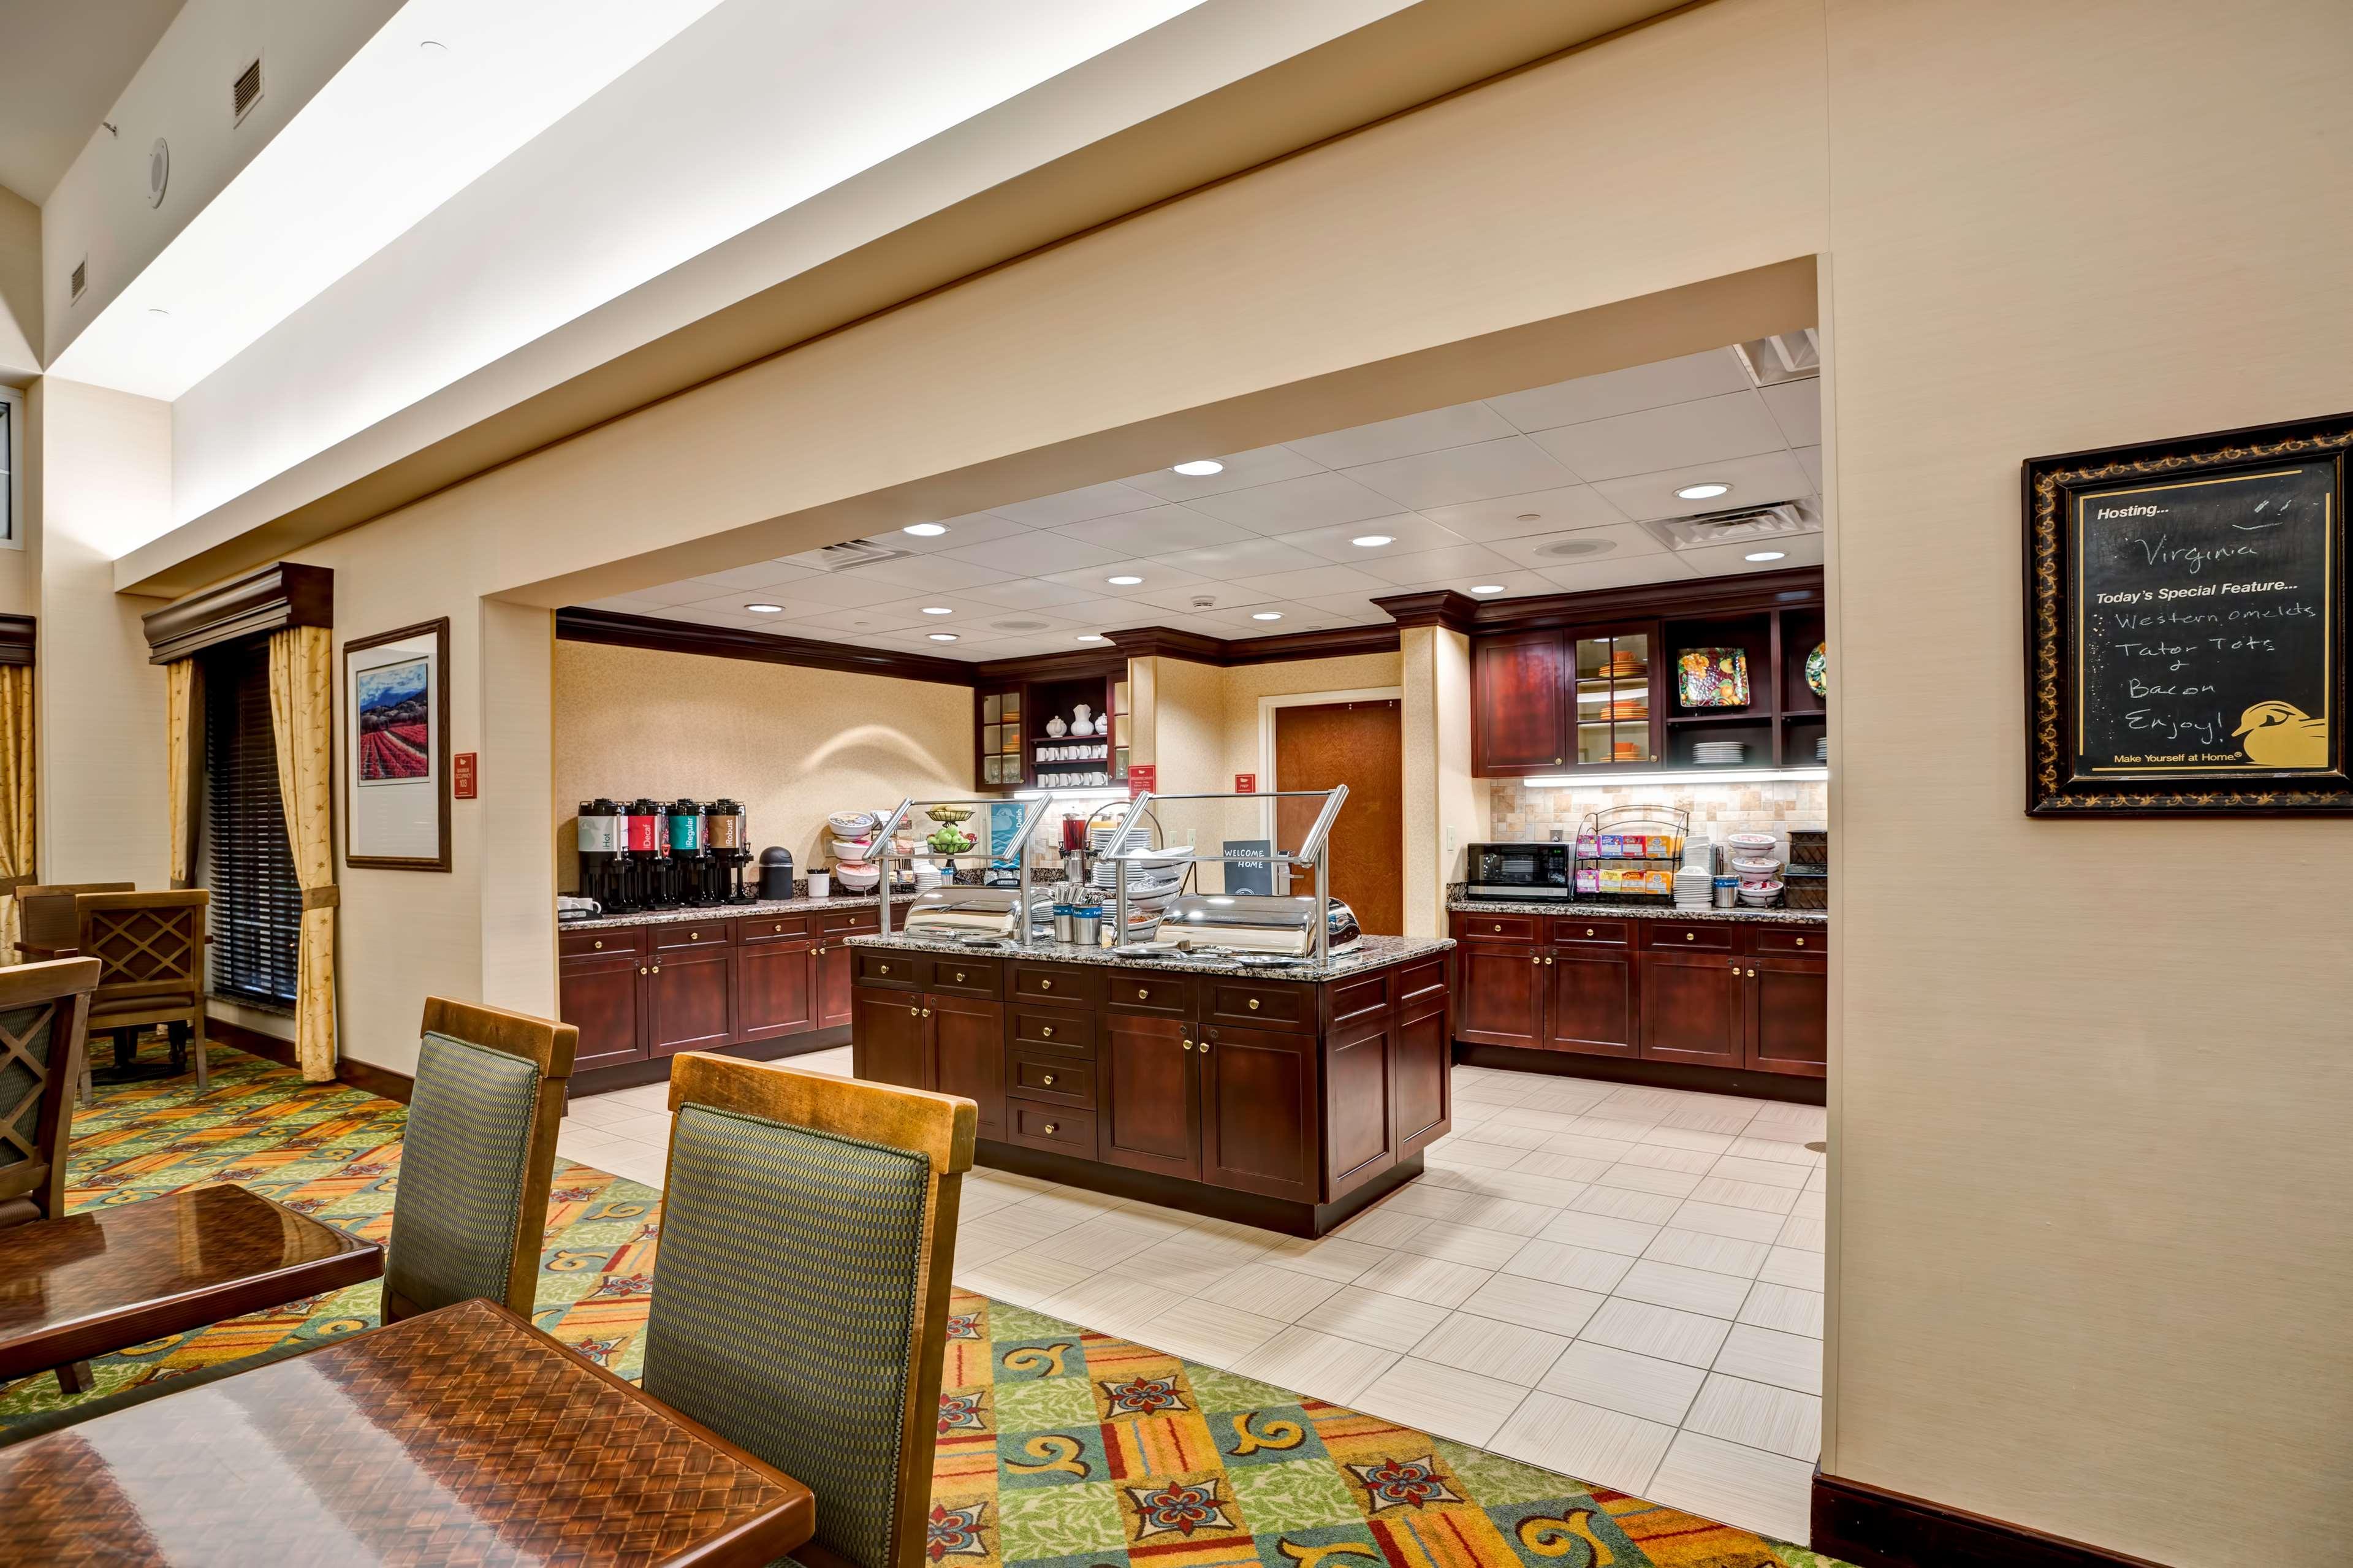 Homewood Suites by Hilton Fredericksburg image 10